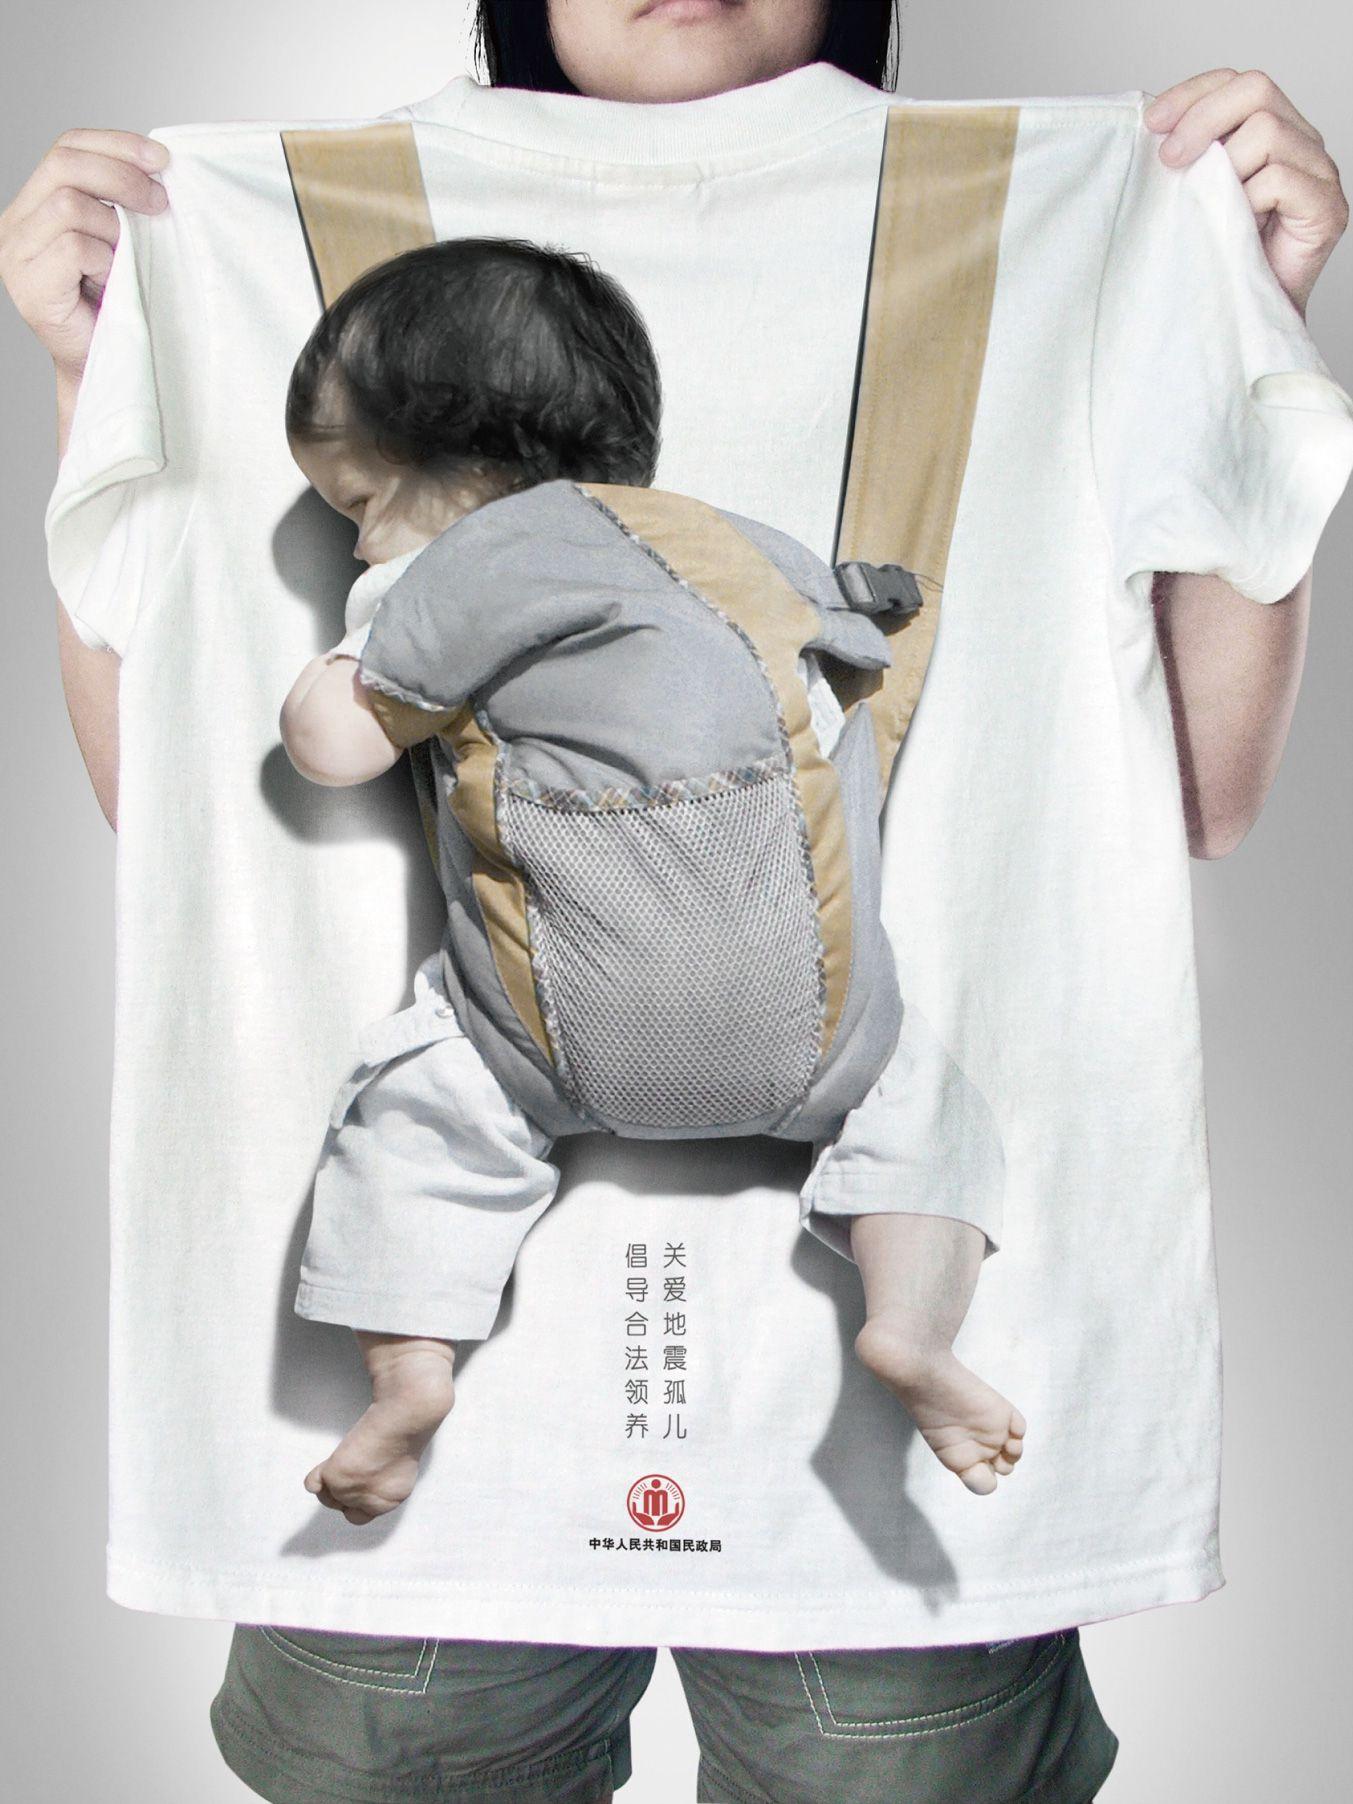 Creative T-Shirt Design For Orphans - Gute Werbung | PIXEL ...